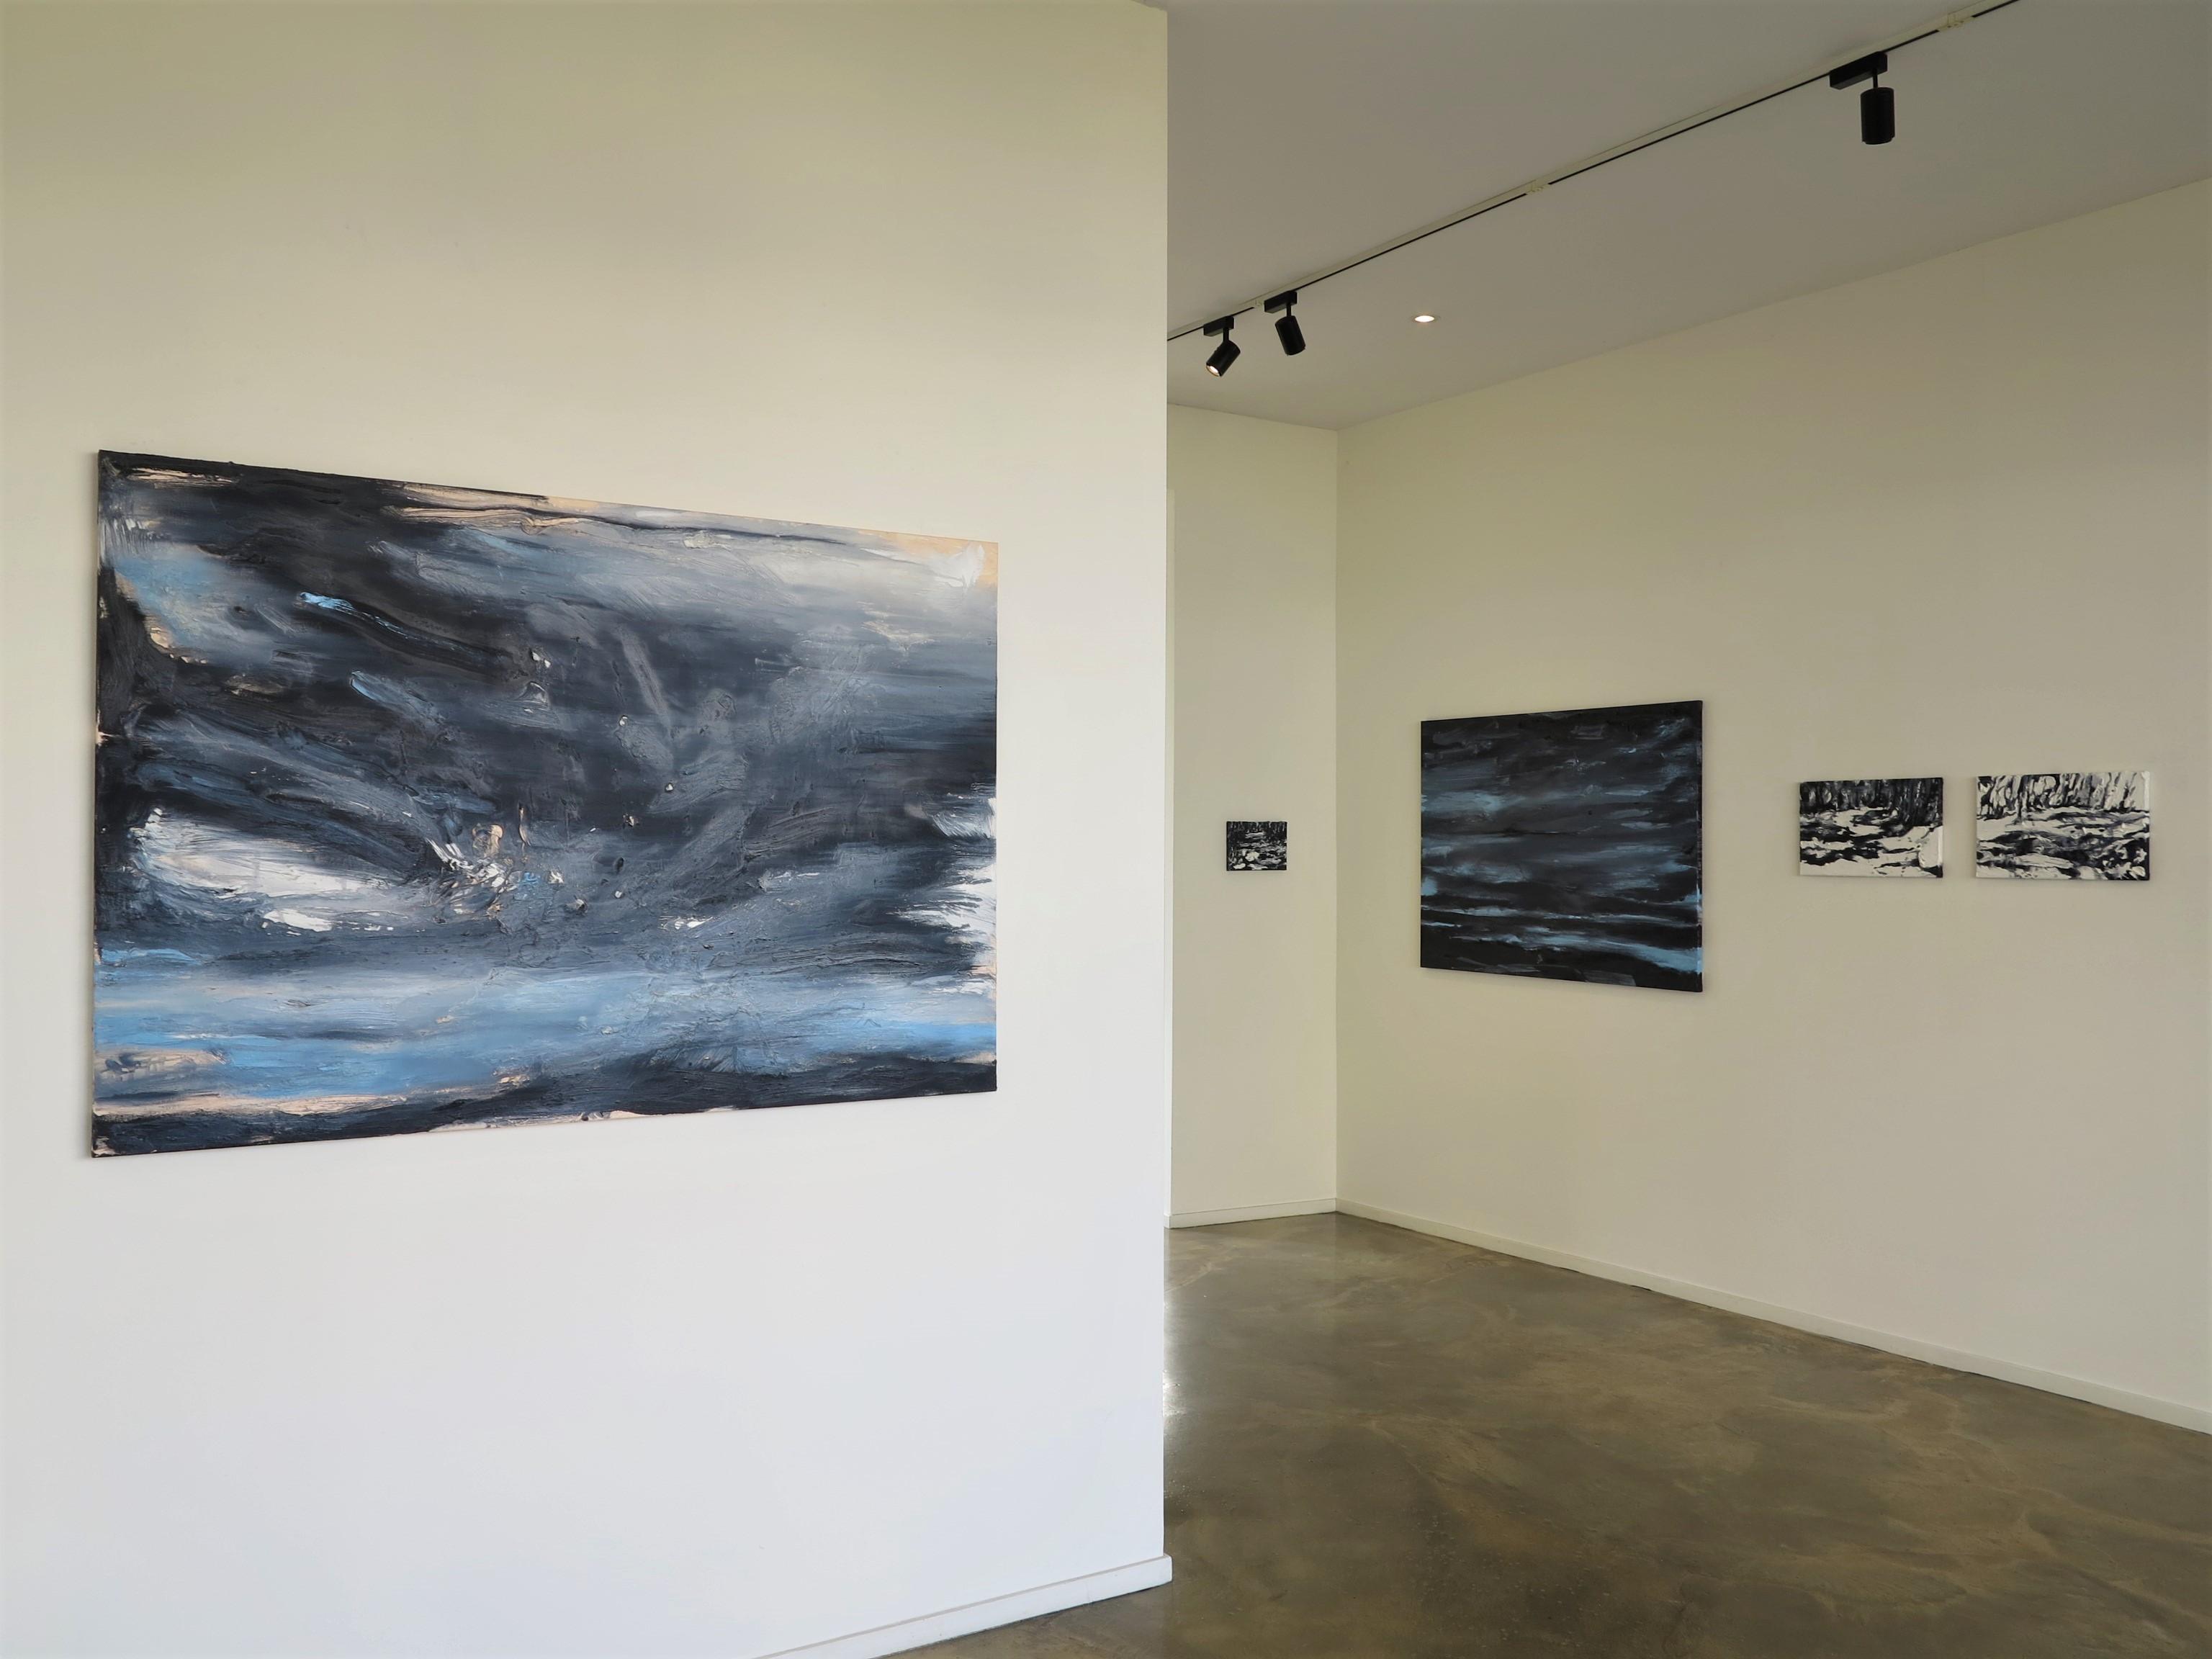 """Dämmerung"", solo exhibition, Livingstone Gallery, The Hague (2019)"